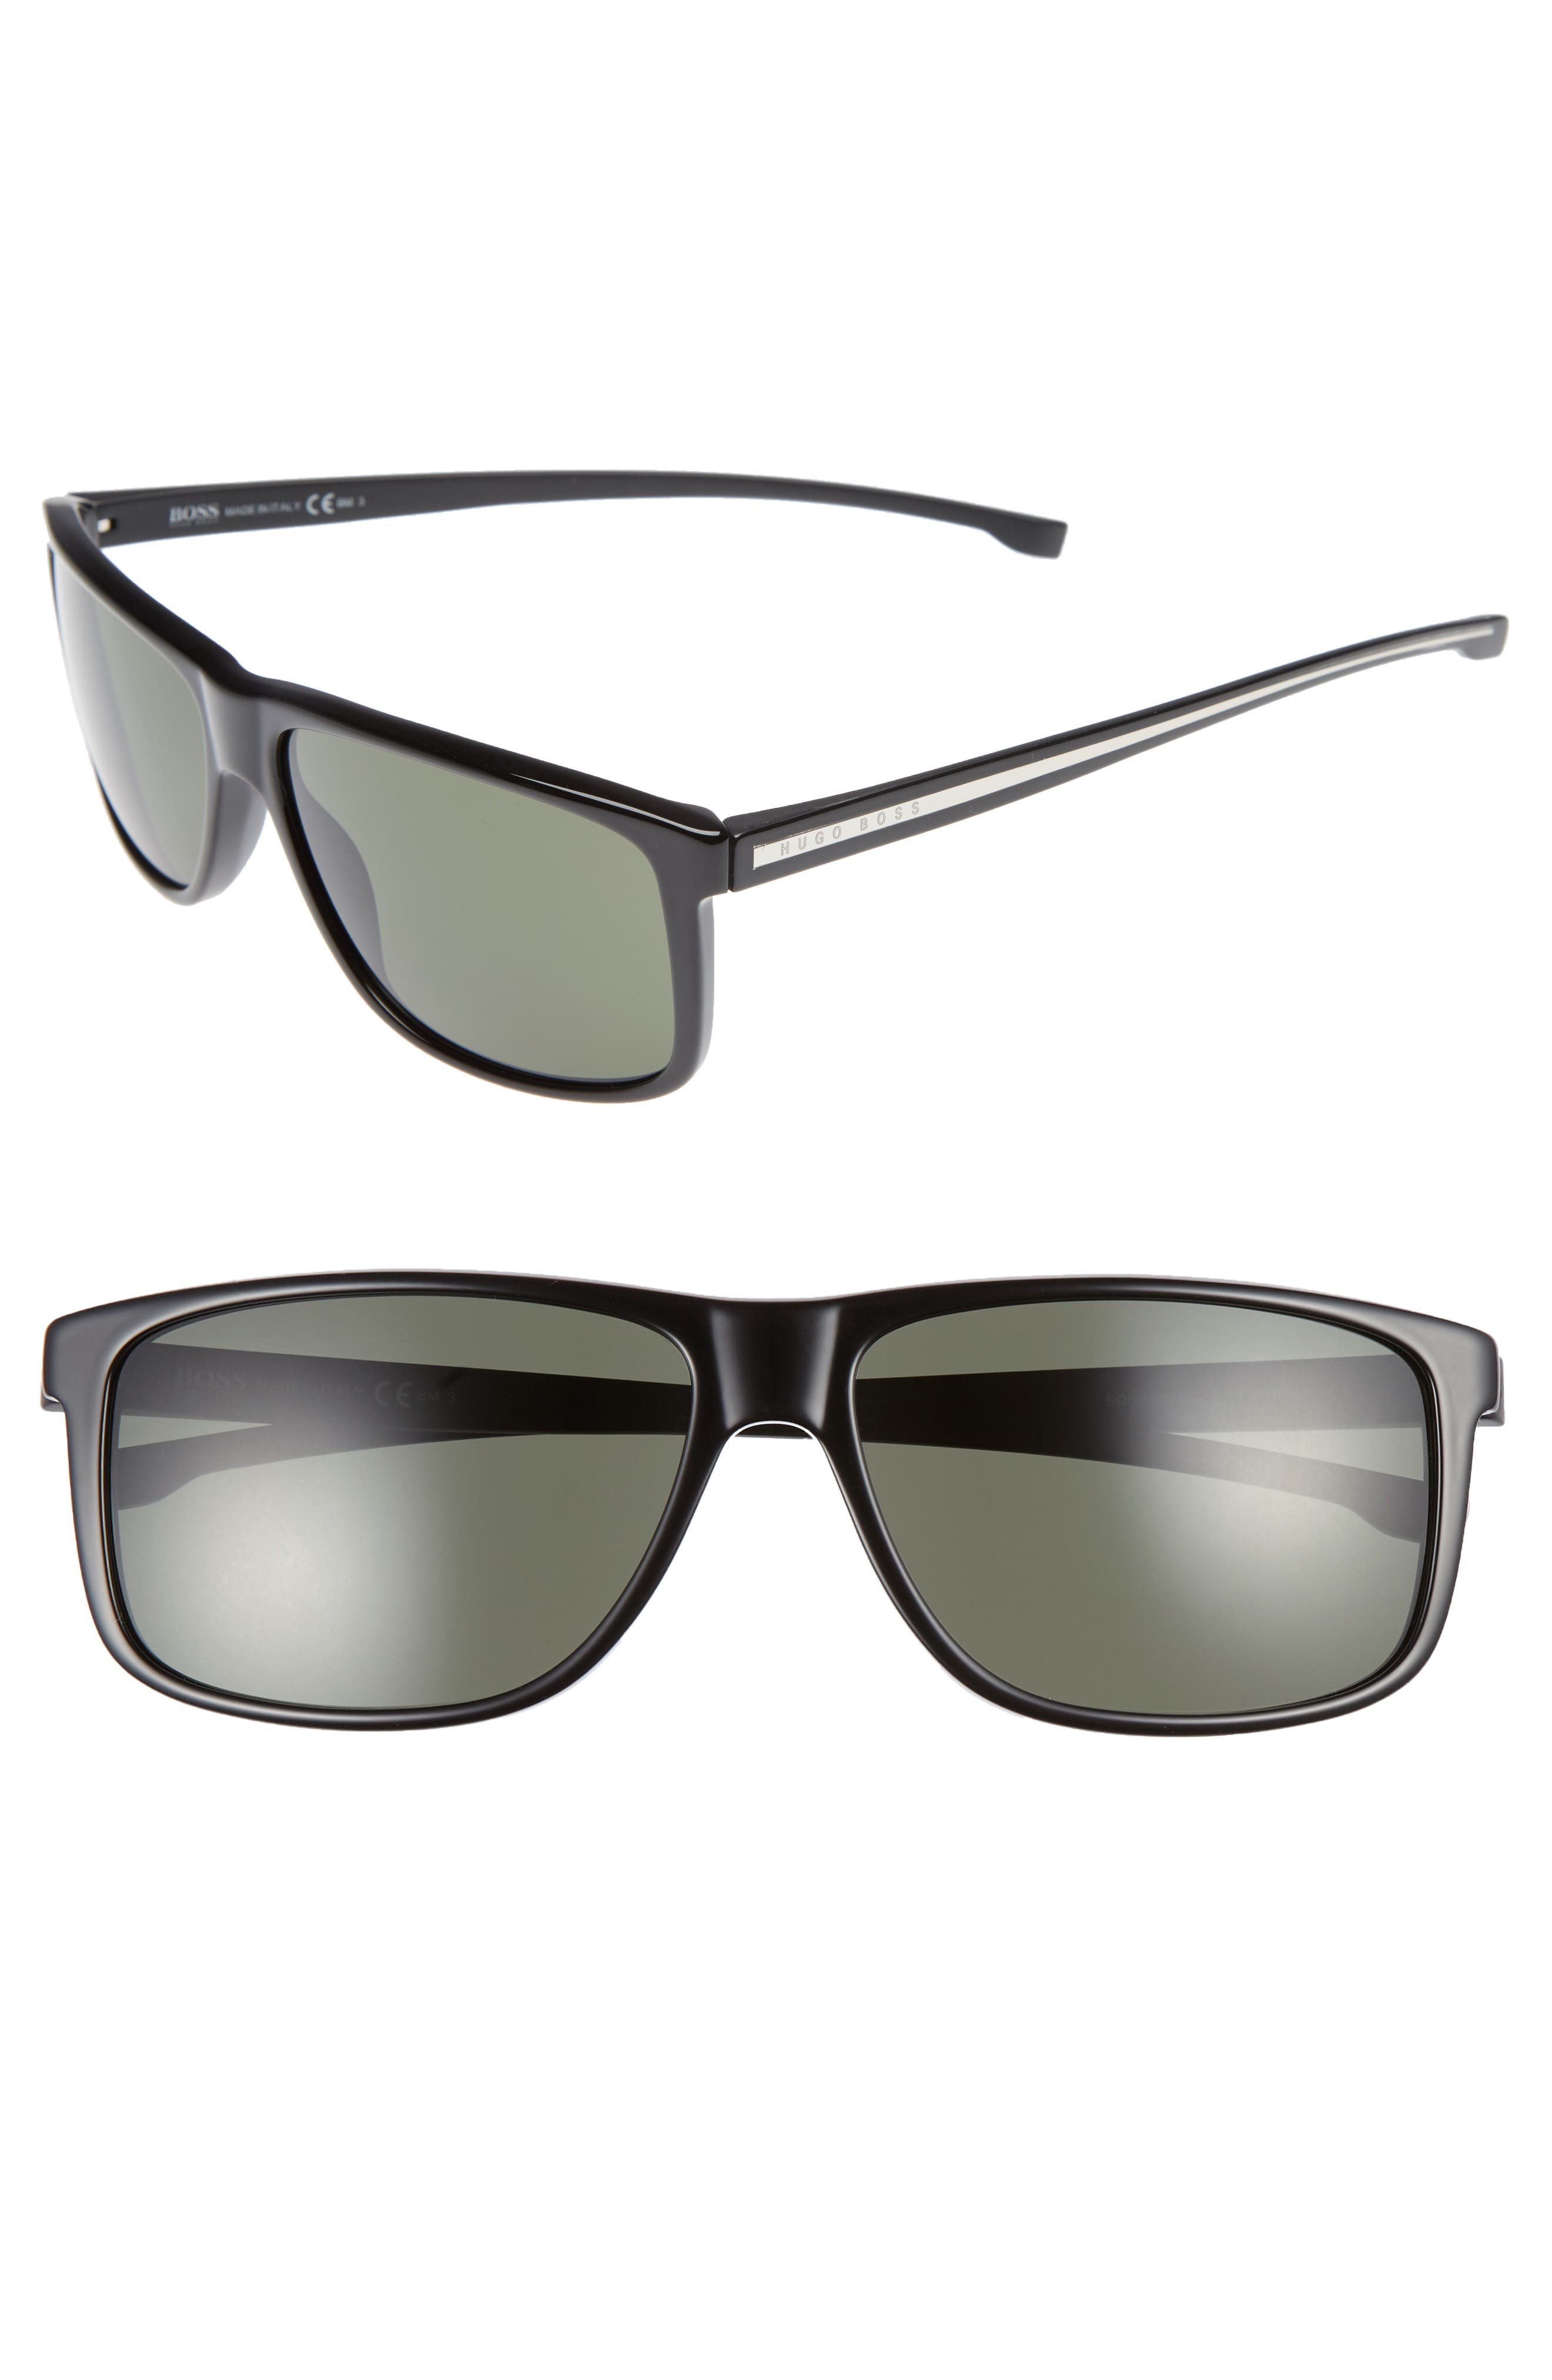 60mm Sunglasses,                             Main thumbnail 1, color,                             BLACK/ GREY GREEN